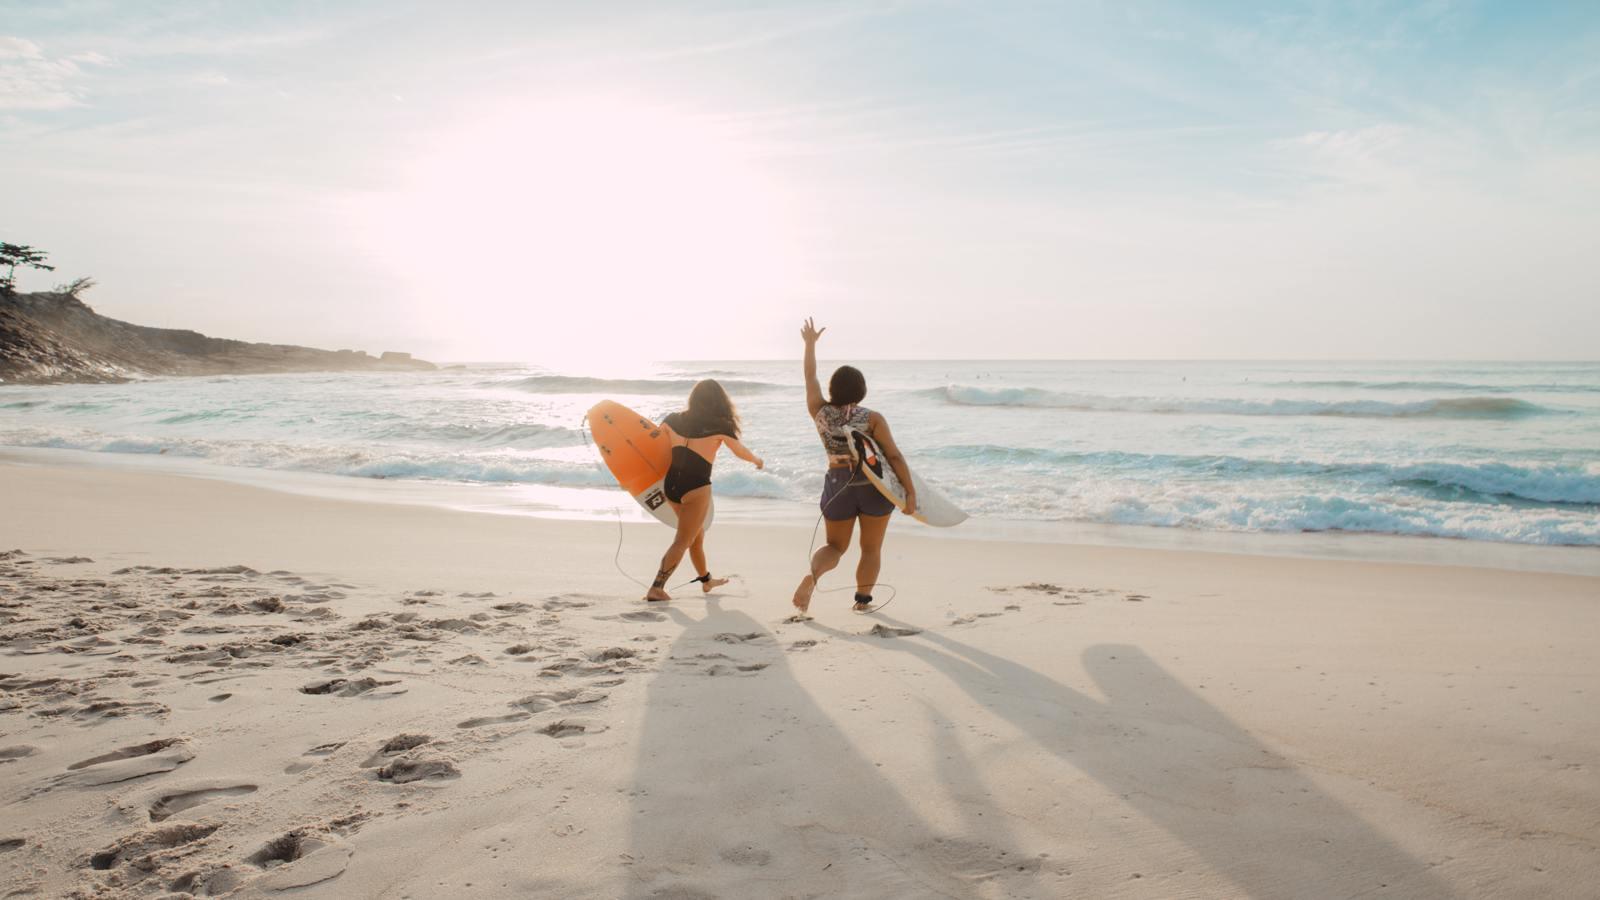 Vamos A La Playa! 50 Spanish Beach Vocabulary Words and Phrases